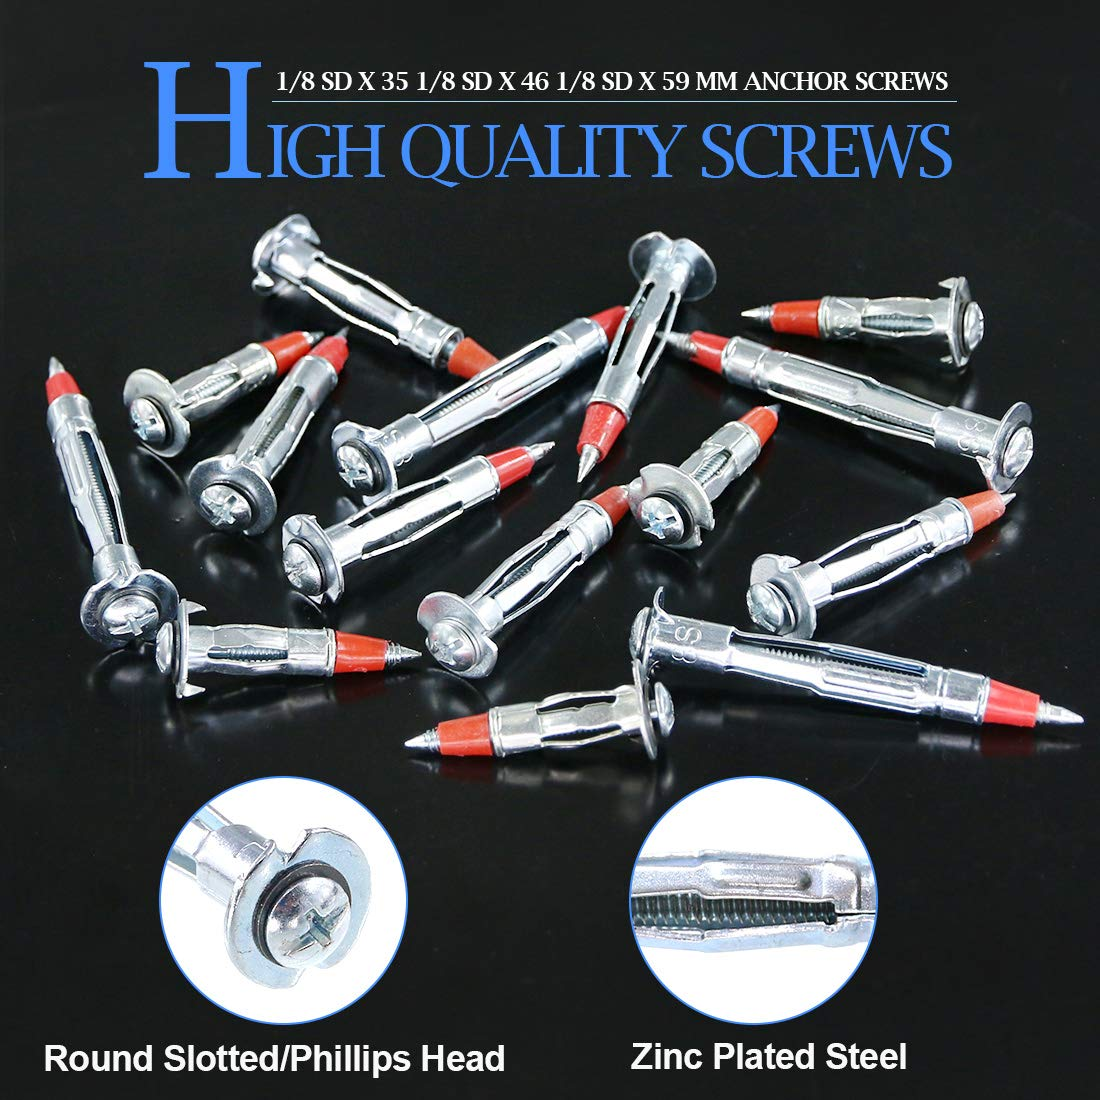 1//8SDx35MM Glarks 60Pcs Heavy Duty 1//8 inch 35MM Zinc Plated Steel Molly Bolt Drive Hollow Drive Wall Anchor Screws Set